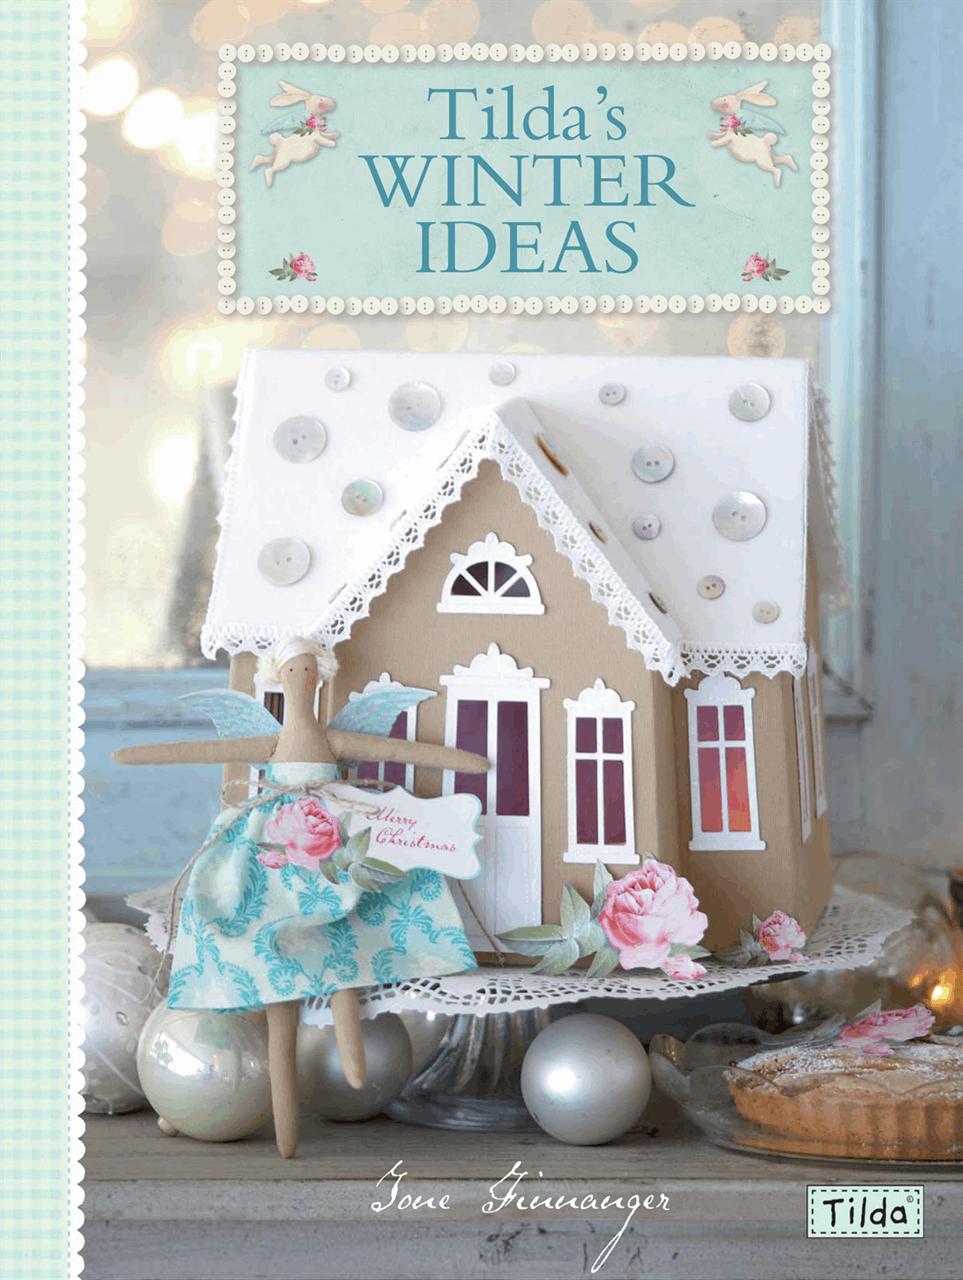 Tilda Winter Ideas Book